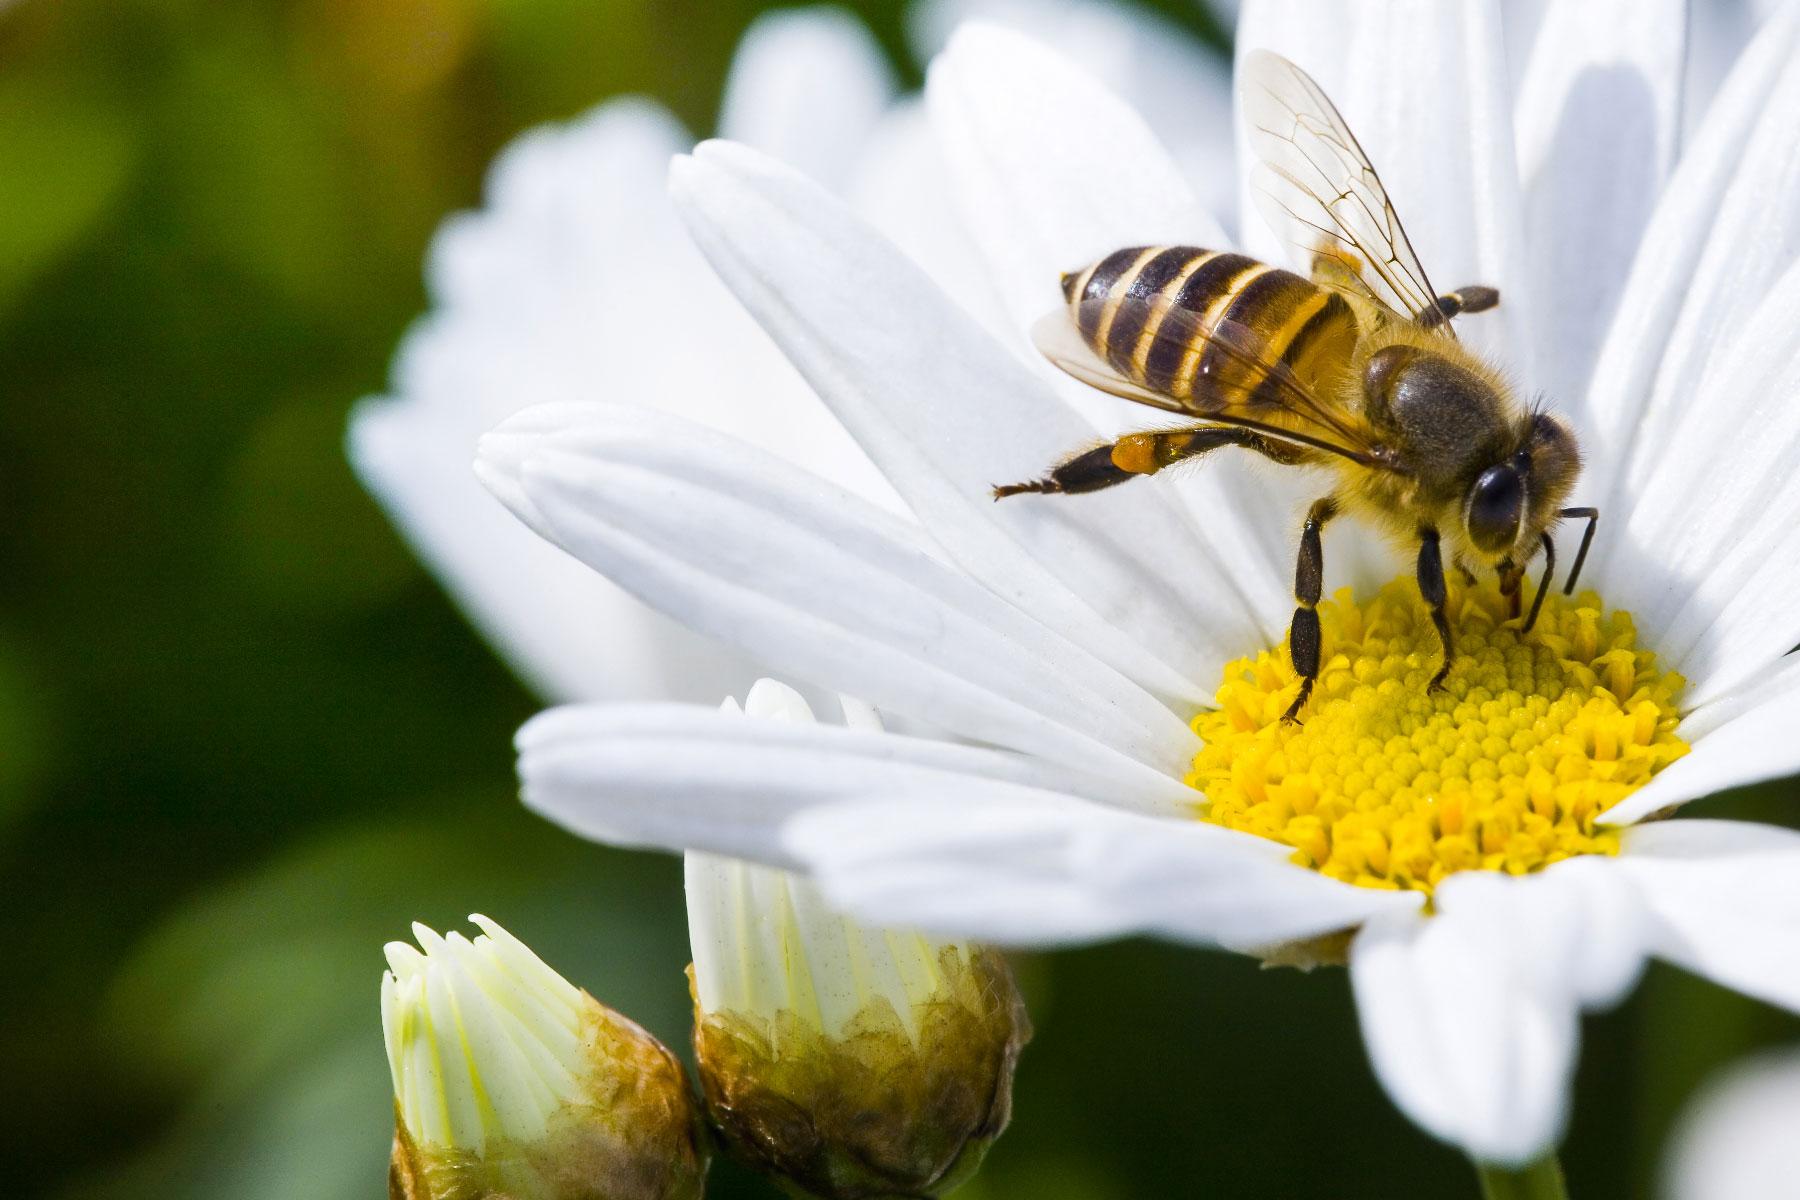 Three ways EI is helping bees